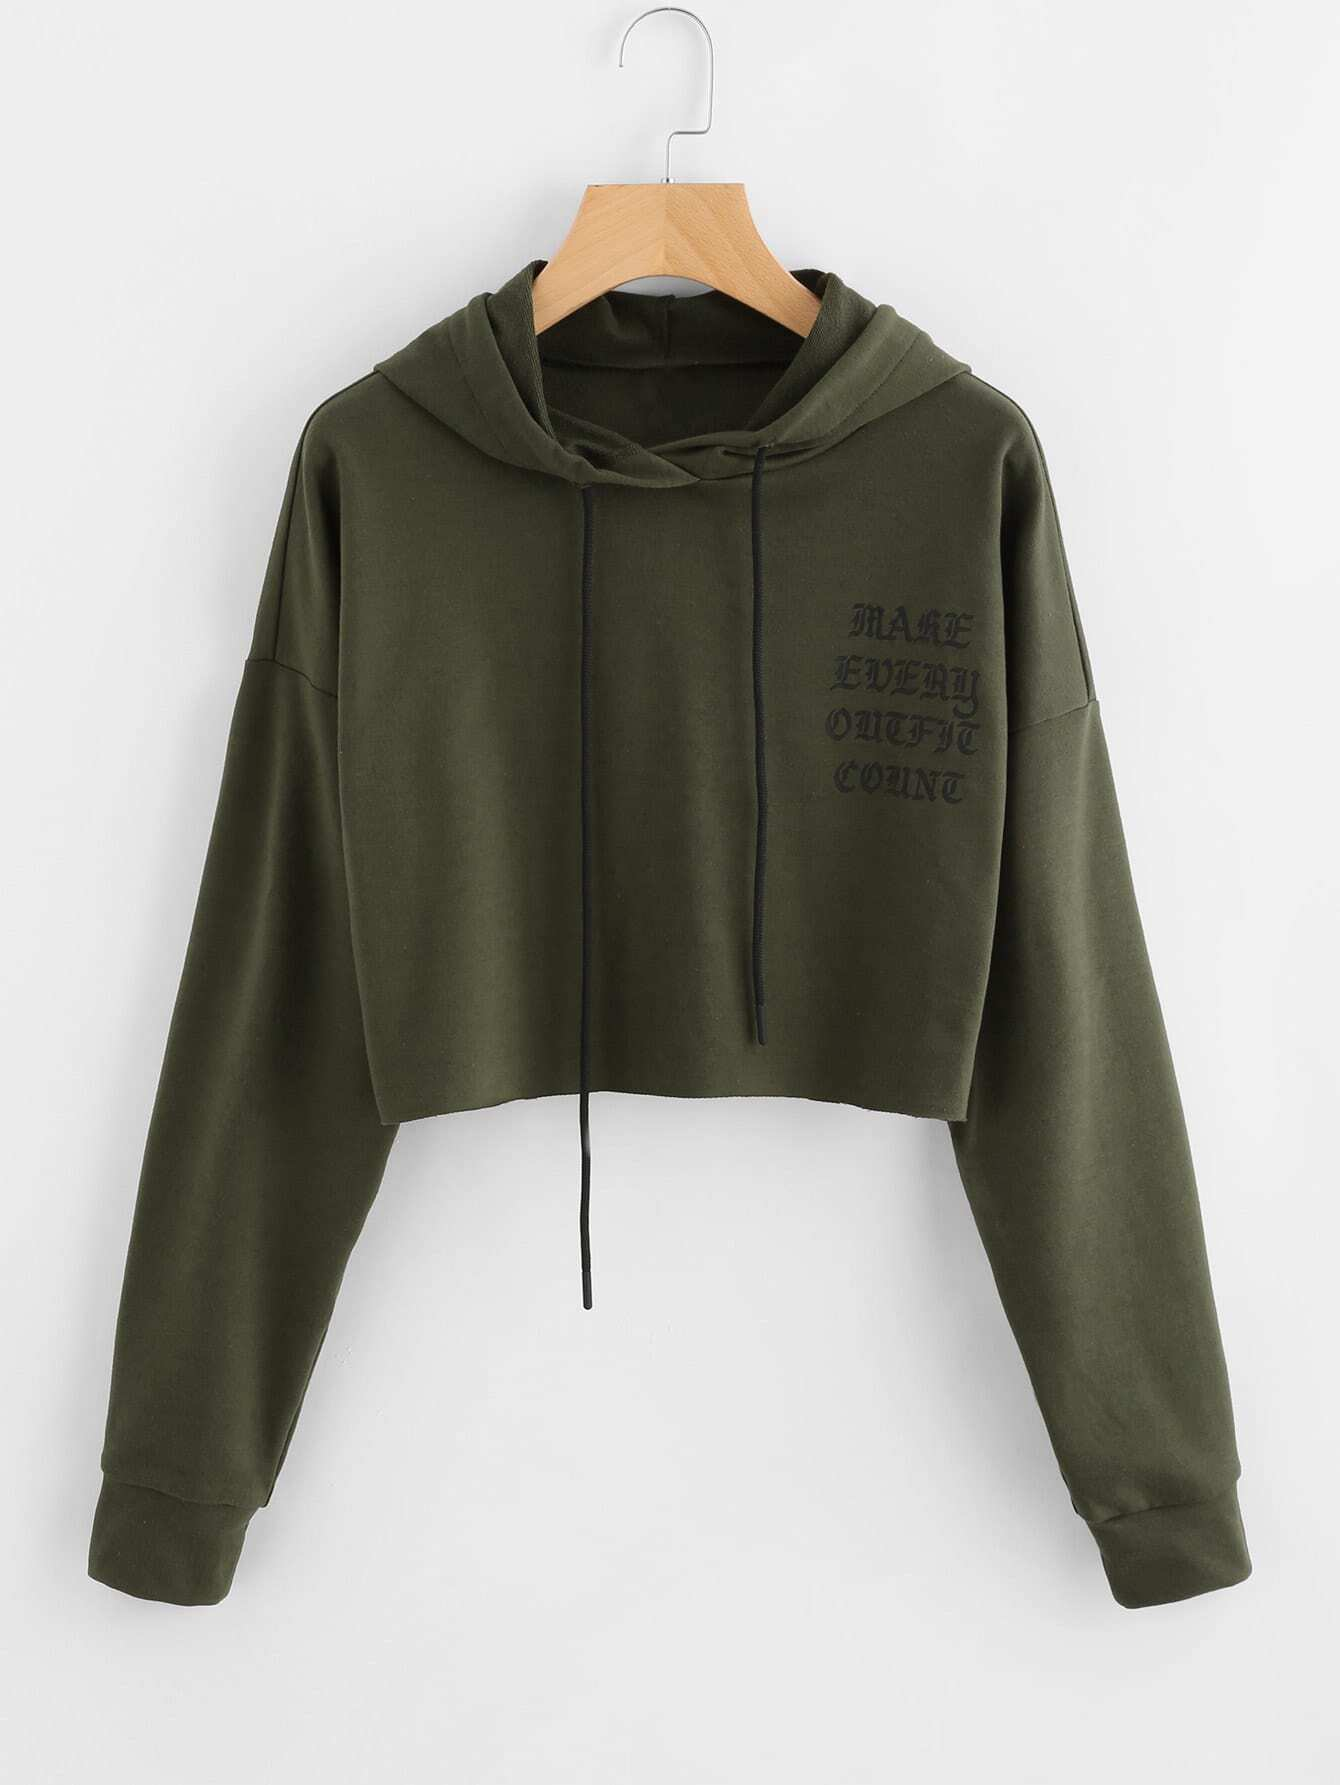 Drop Shoulder Raw Cut Hem Crop Hoodie drop shoulder water color crop sweatshirt